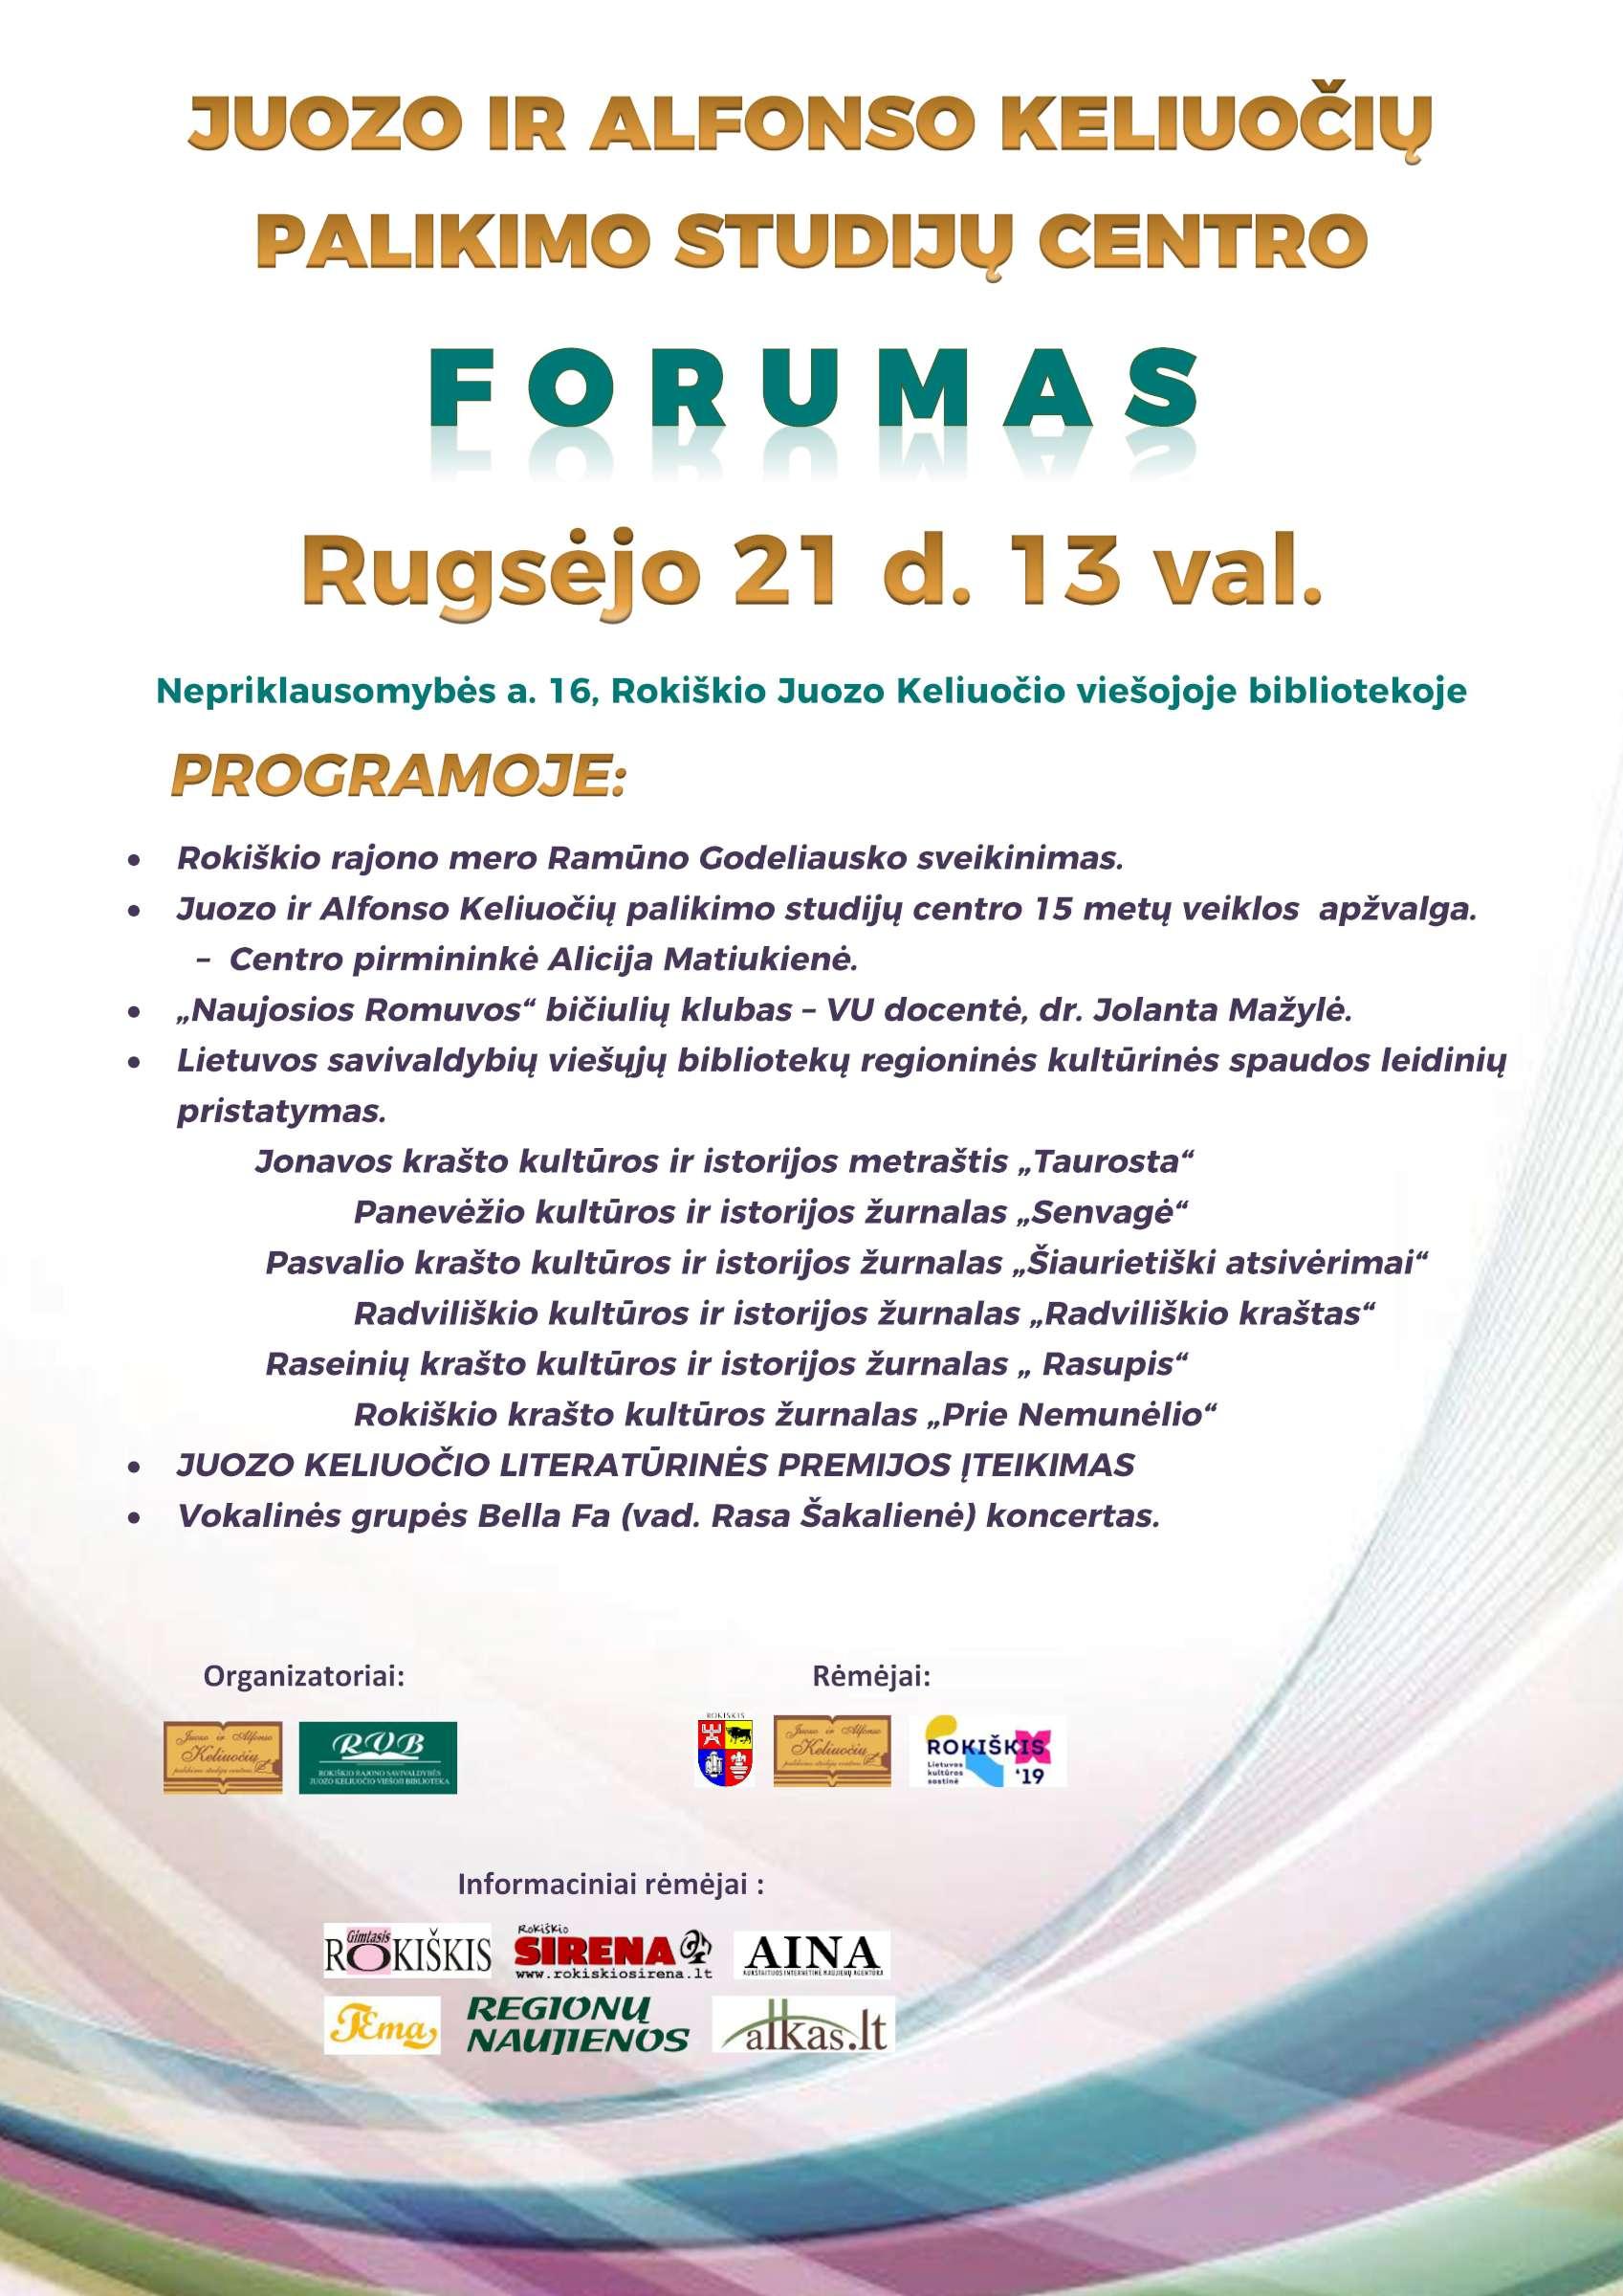 Forumas 1-2400